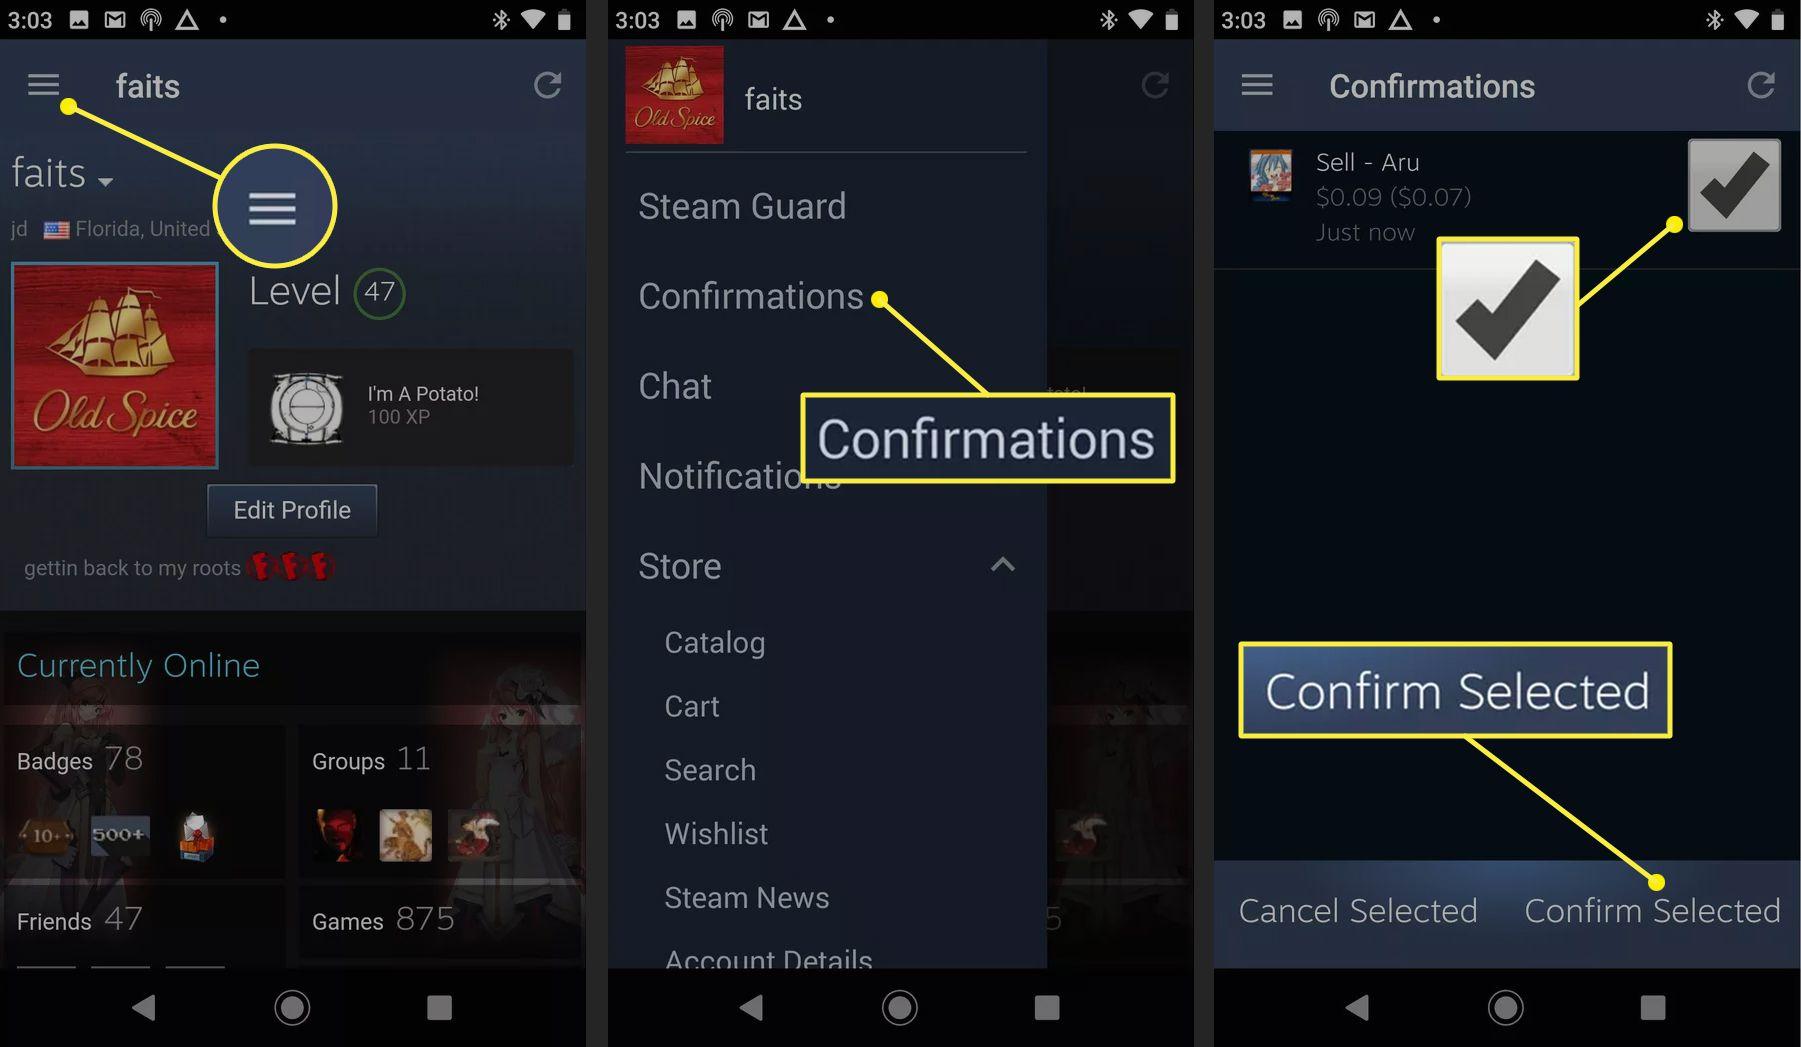 Steam Guard app approval screens